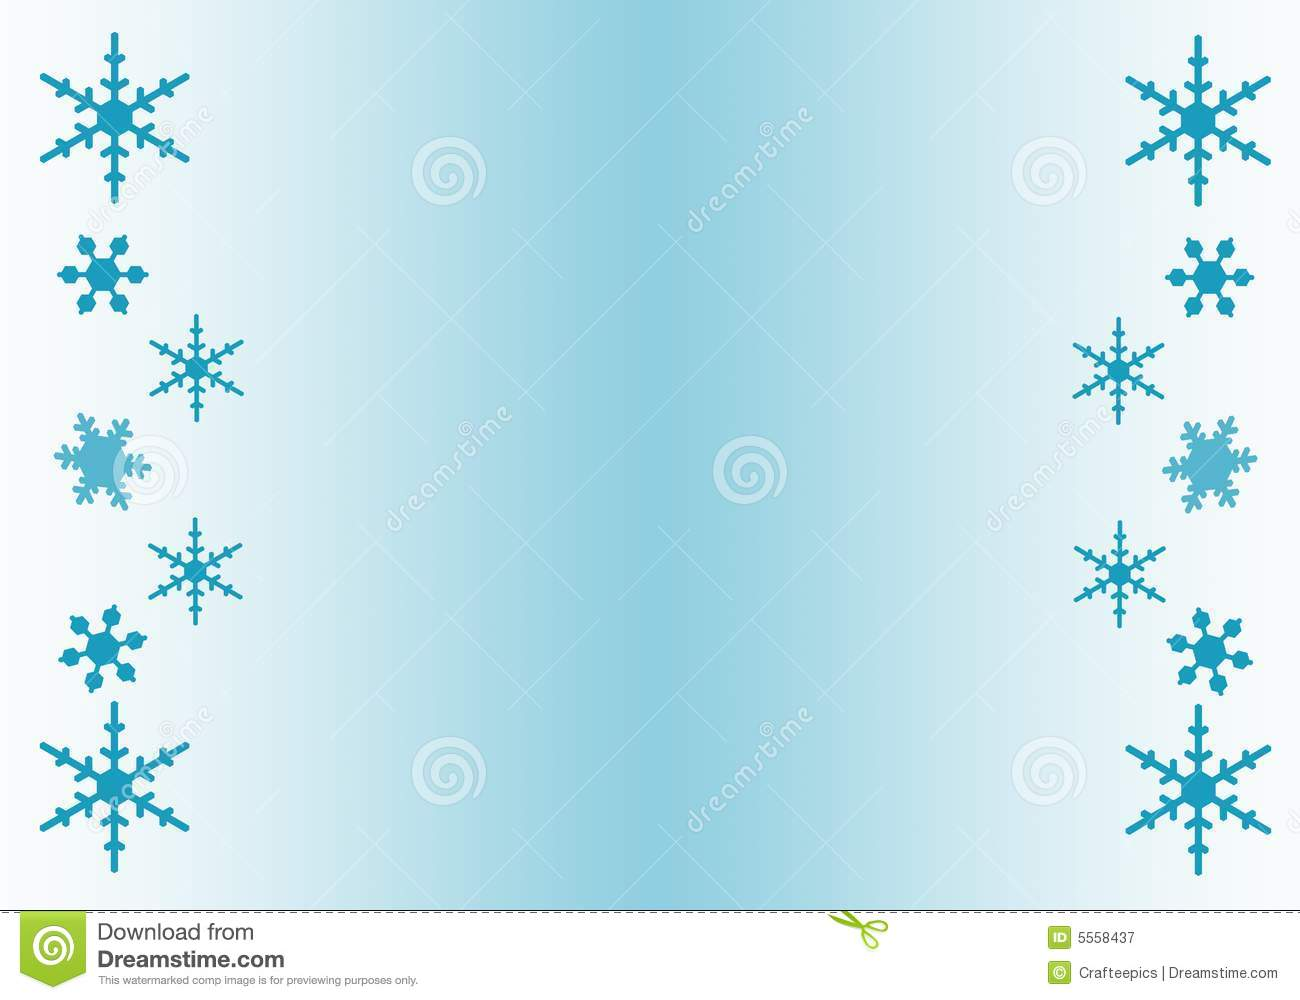 Snowflake Clipart Border Snowflake Borde-Snowflake Clipart Border Snowflake Border Clip Art-17